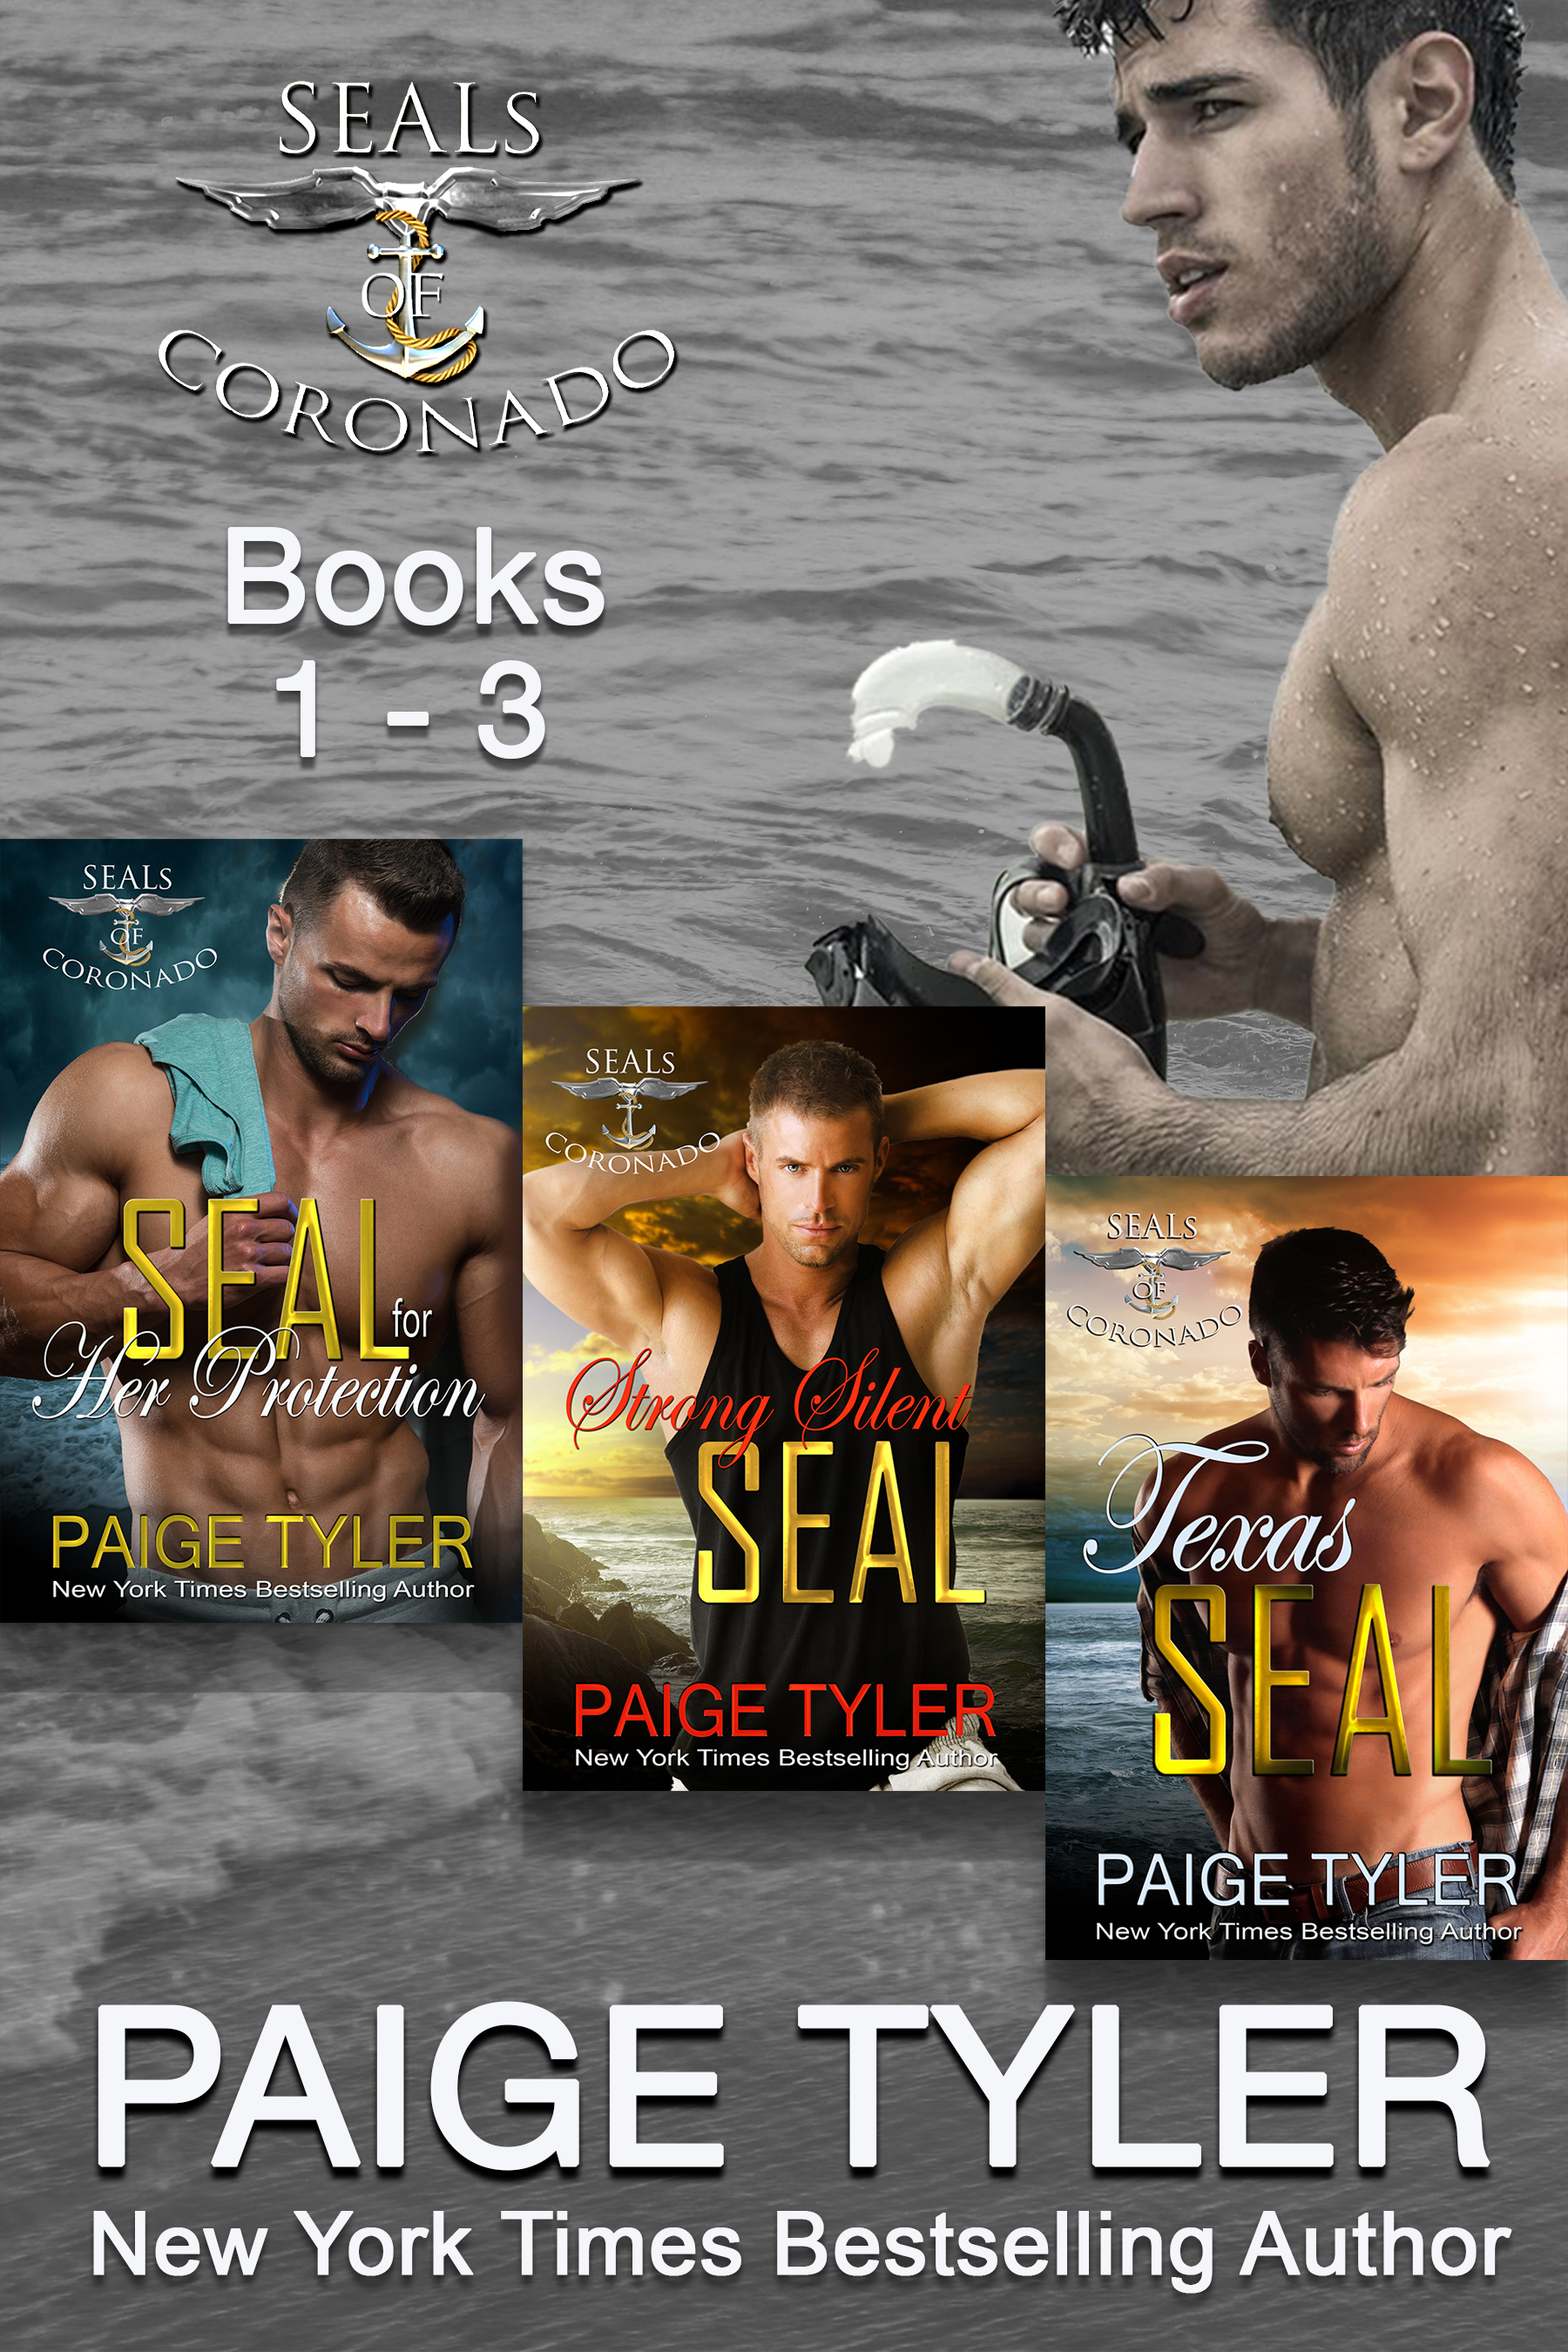 SEALs of Coronado 1 – 3 Some Gray2